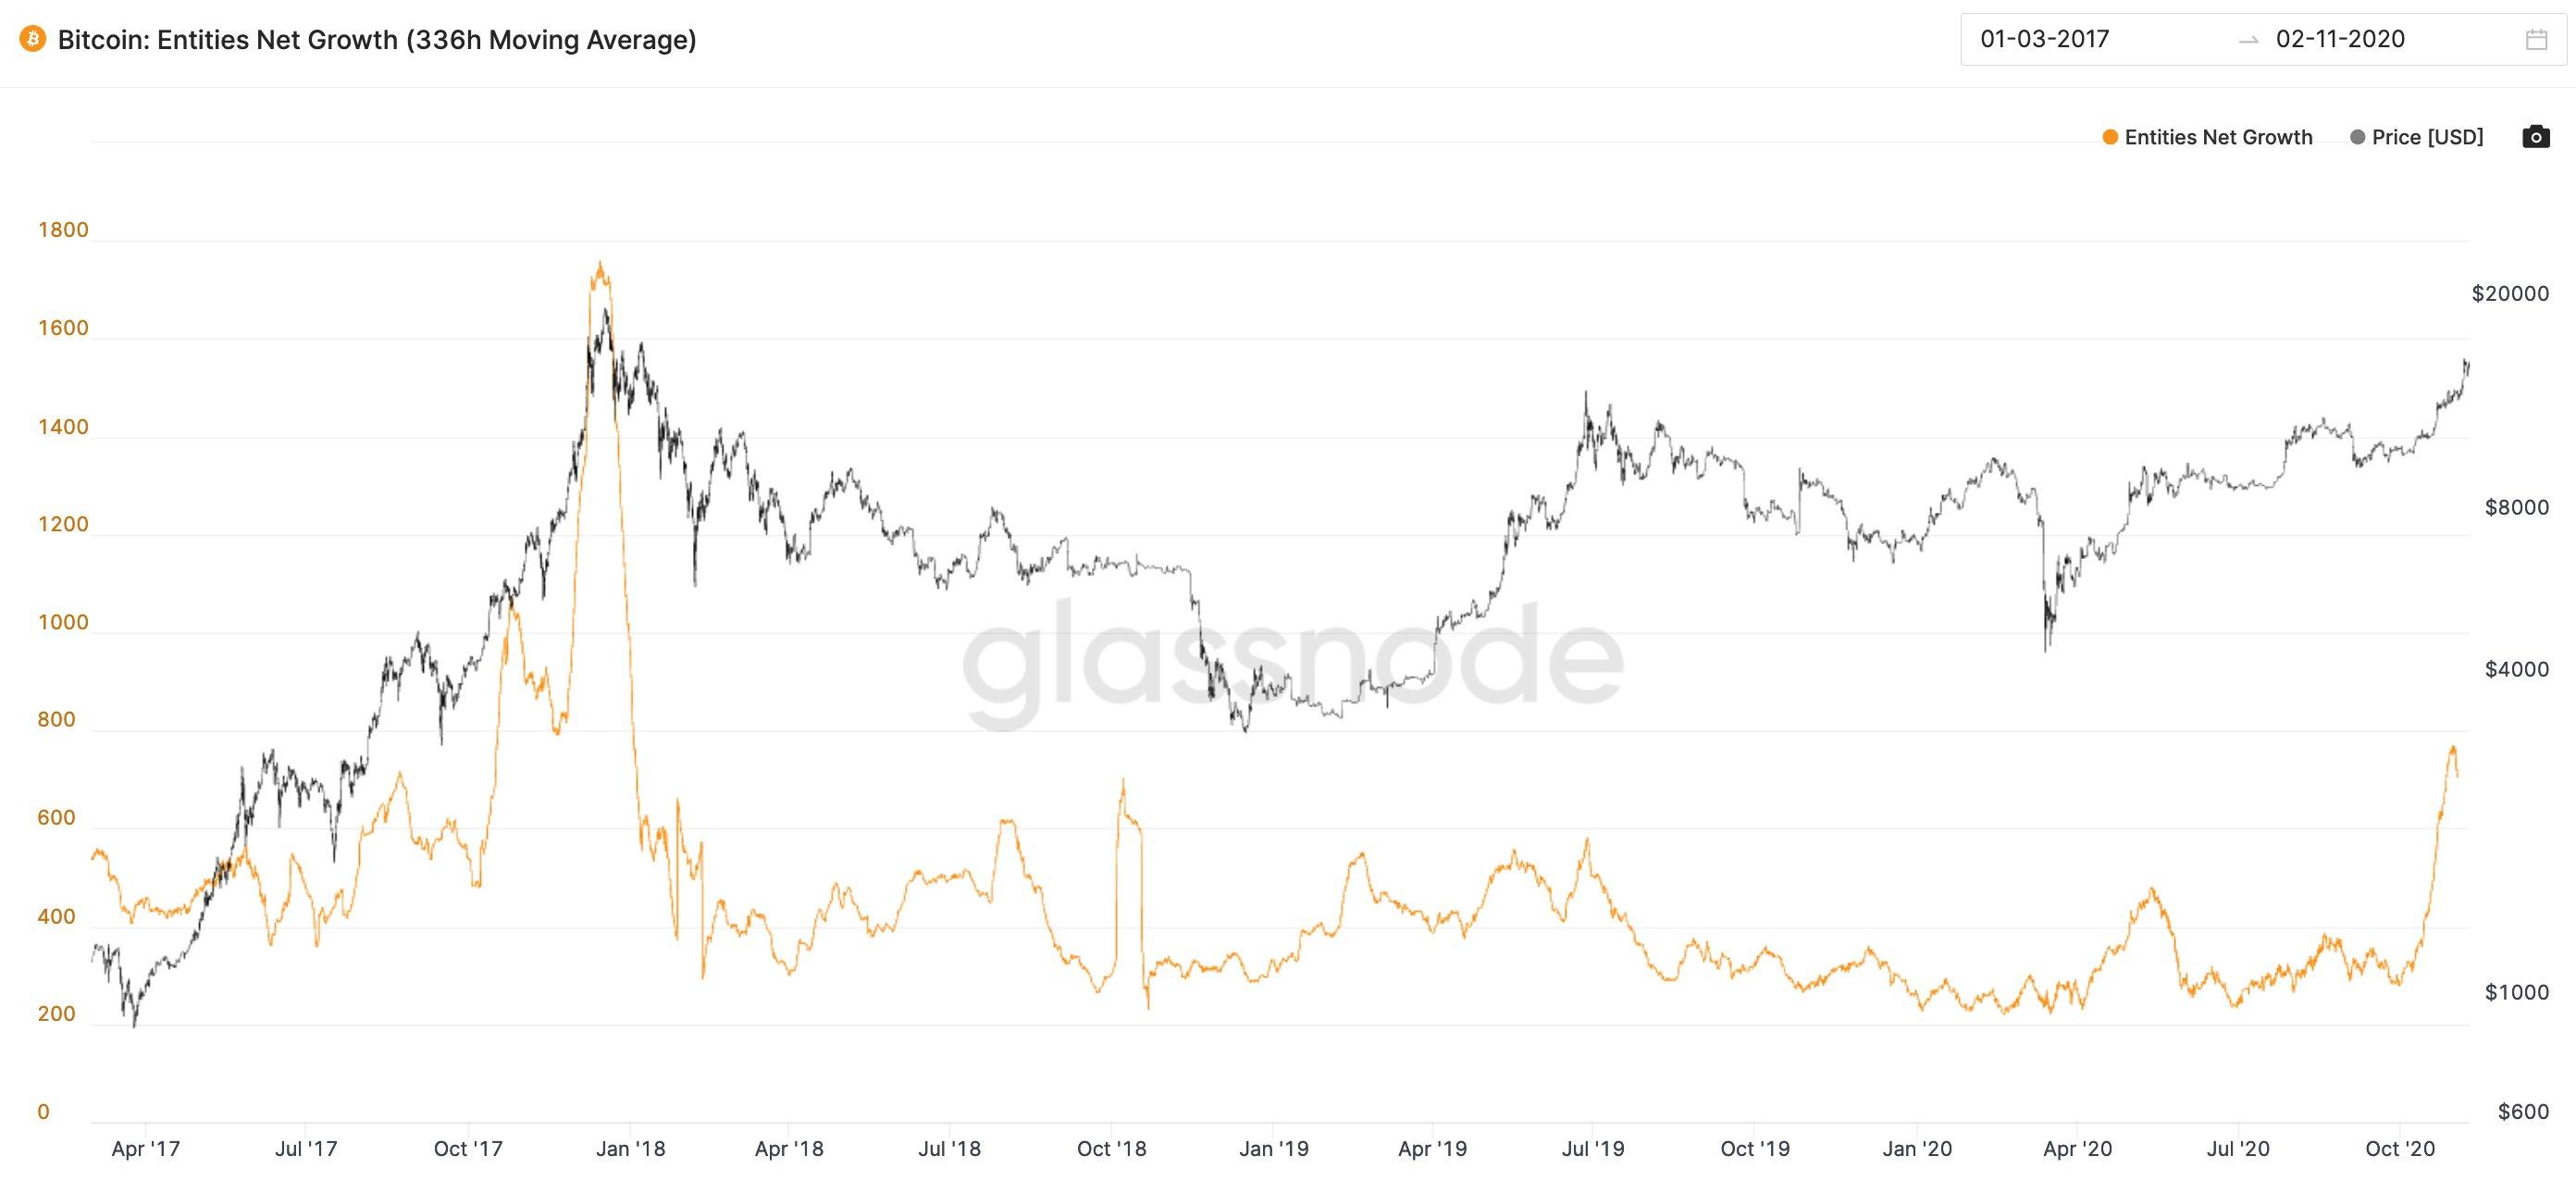 Bitcoin Entity Net Growth